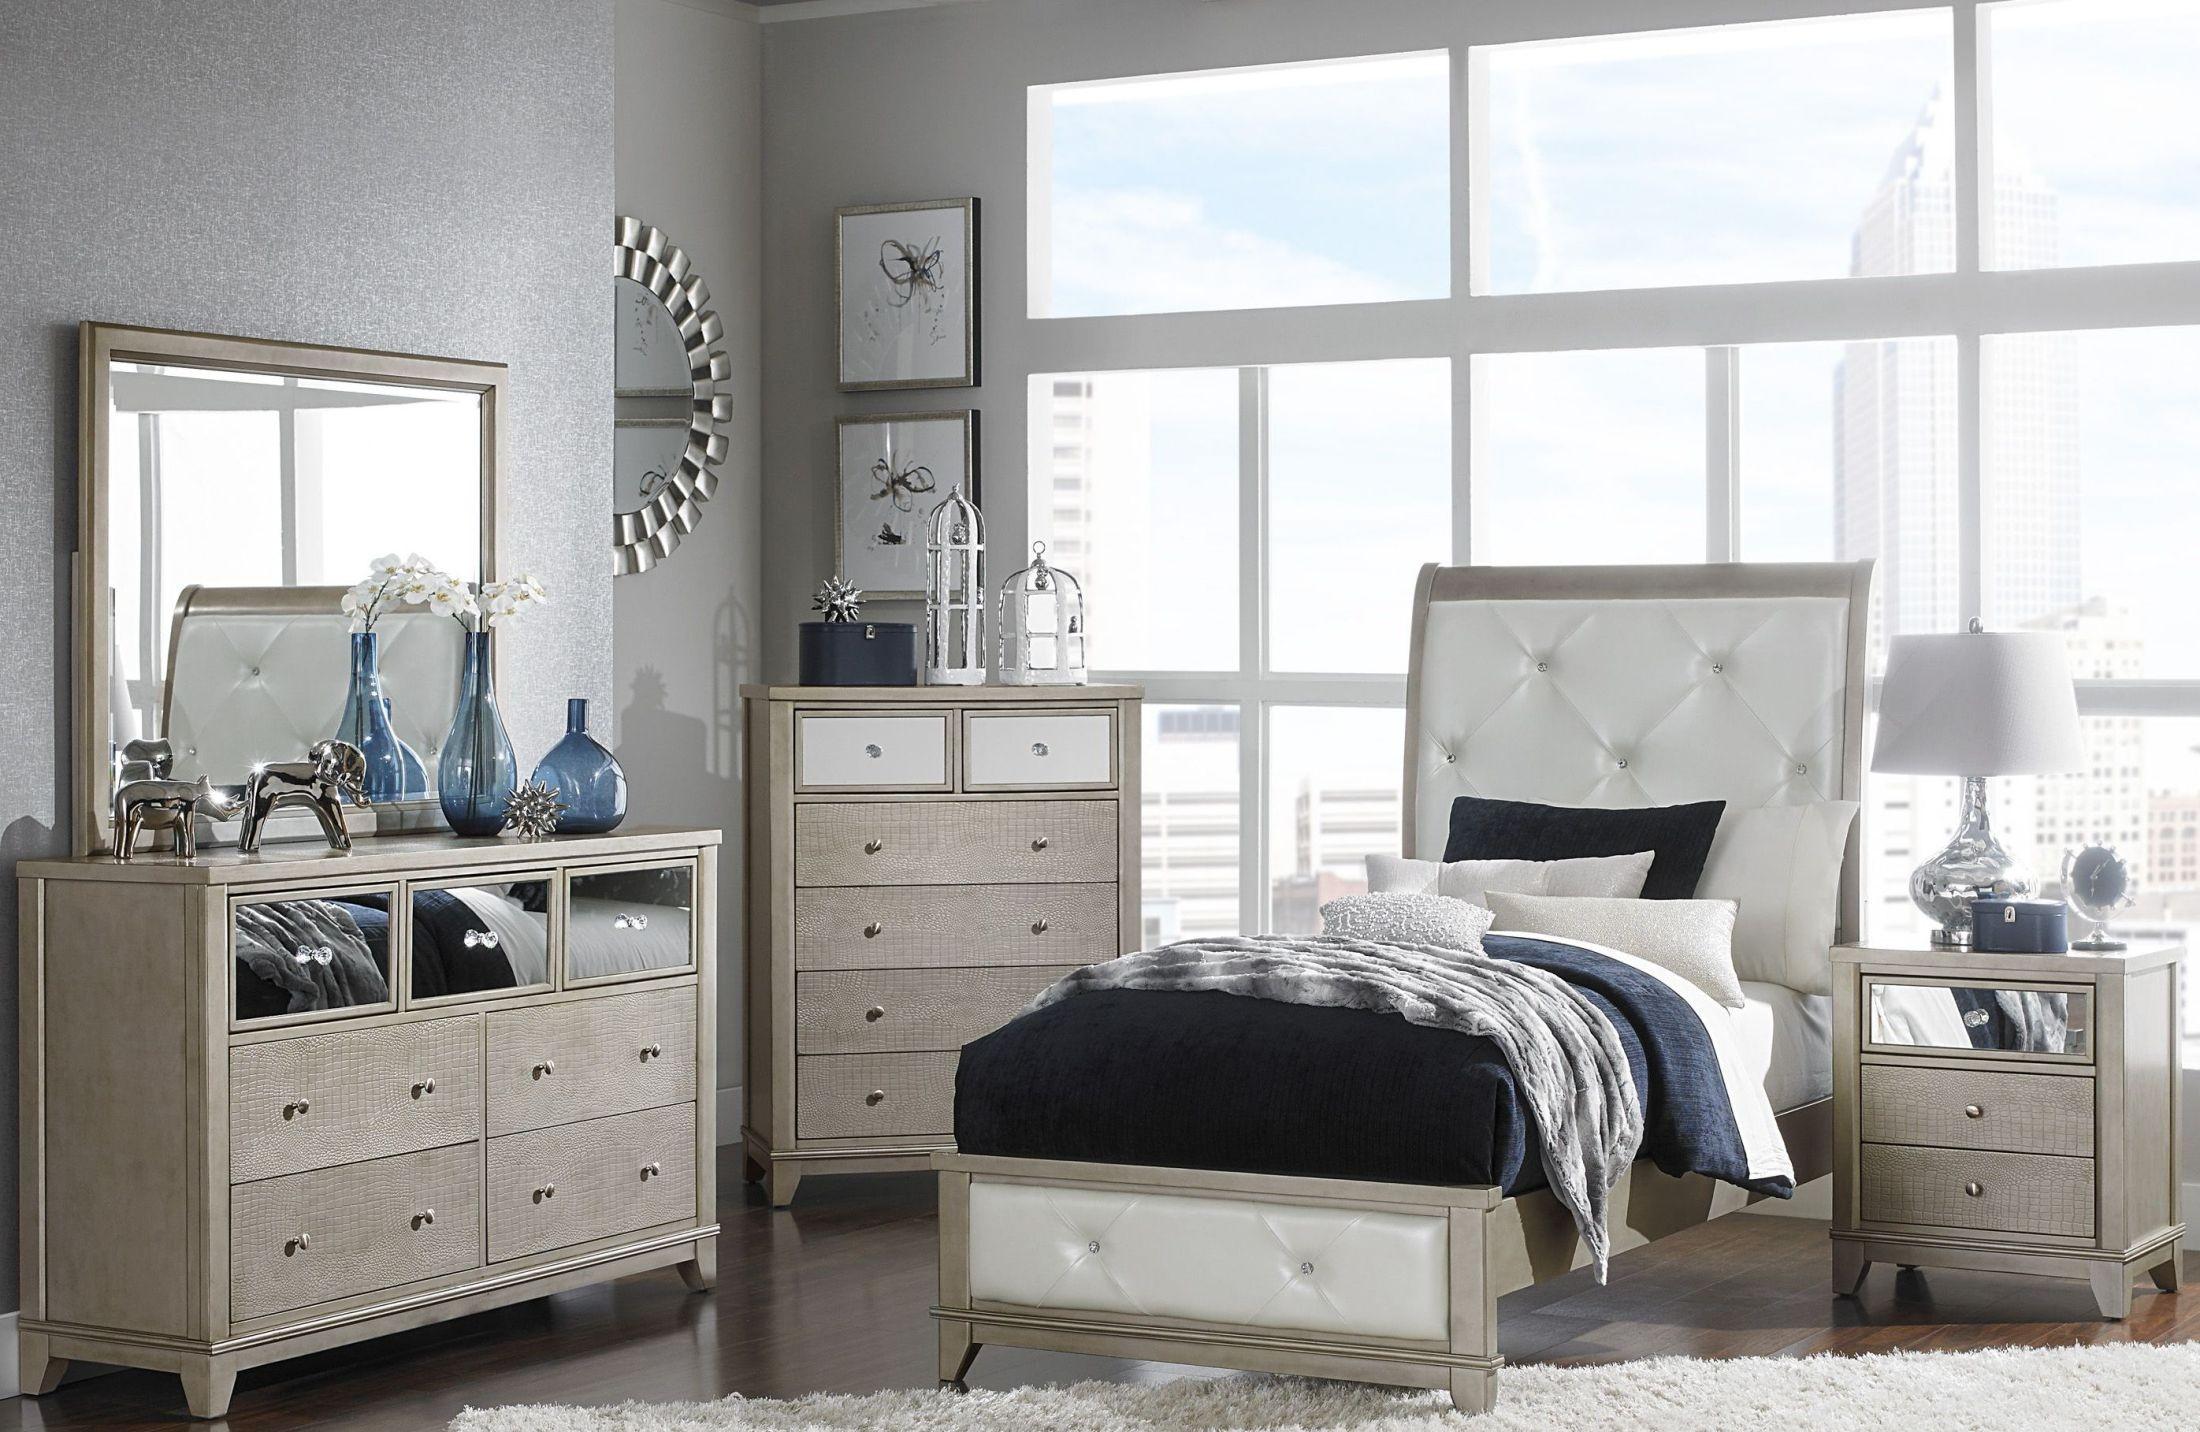 Odelia Pearl White Youth Platform Bedroom Set From Homelegance Coleman Furniture